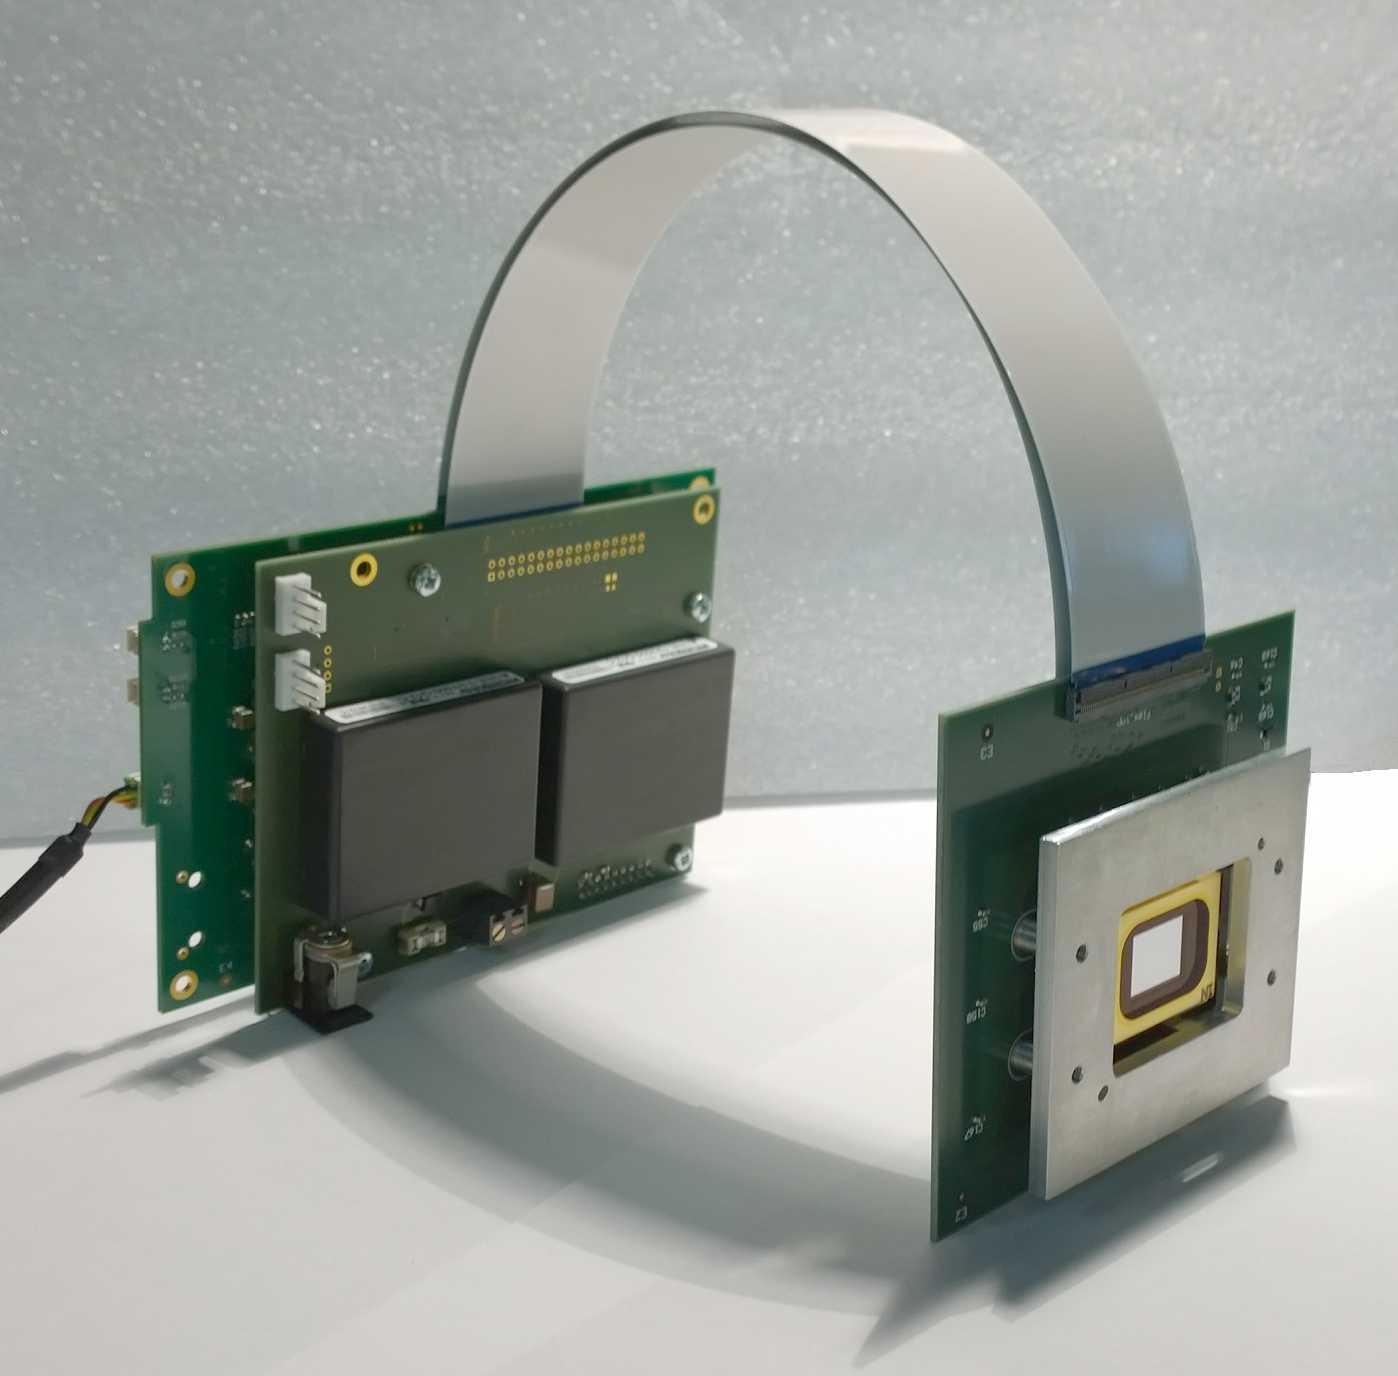 microdisplays, LCOS, LCD, HTPS, DLP design house, DMD